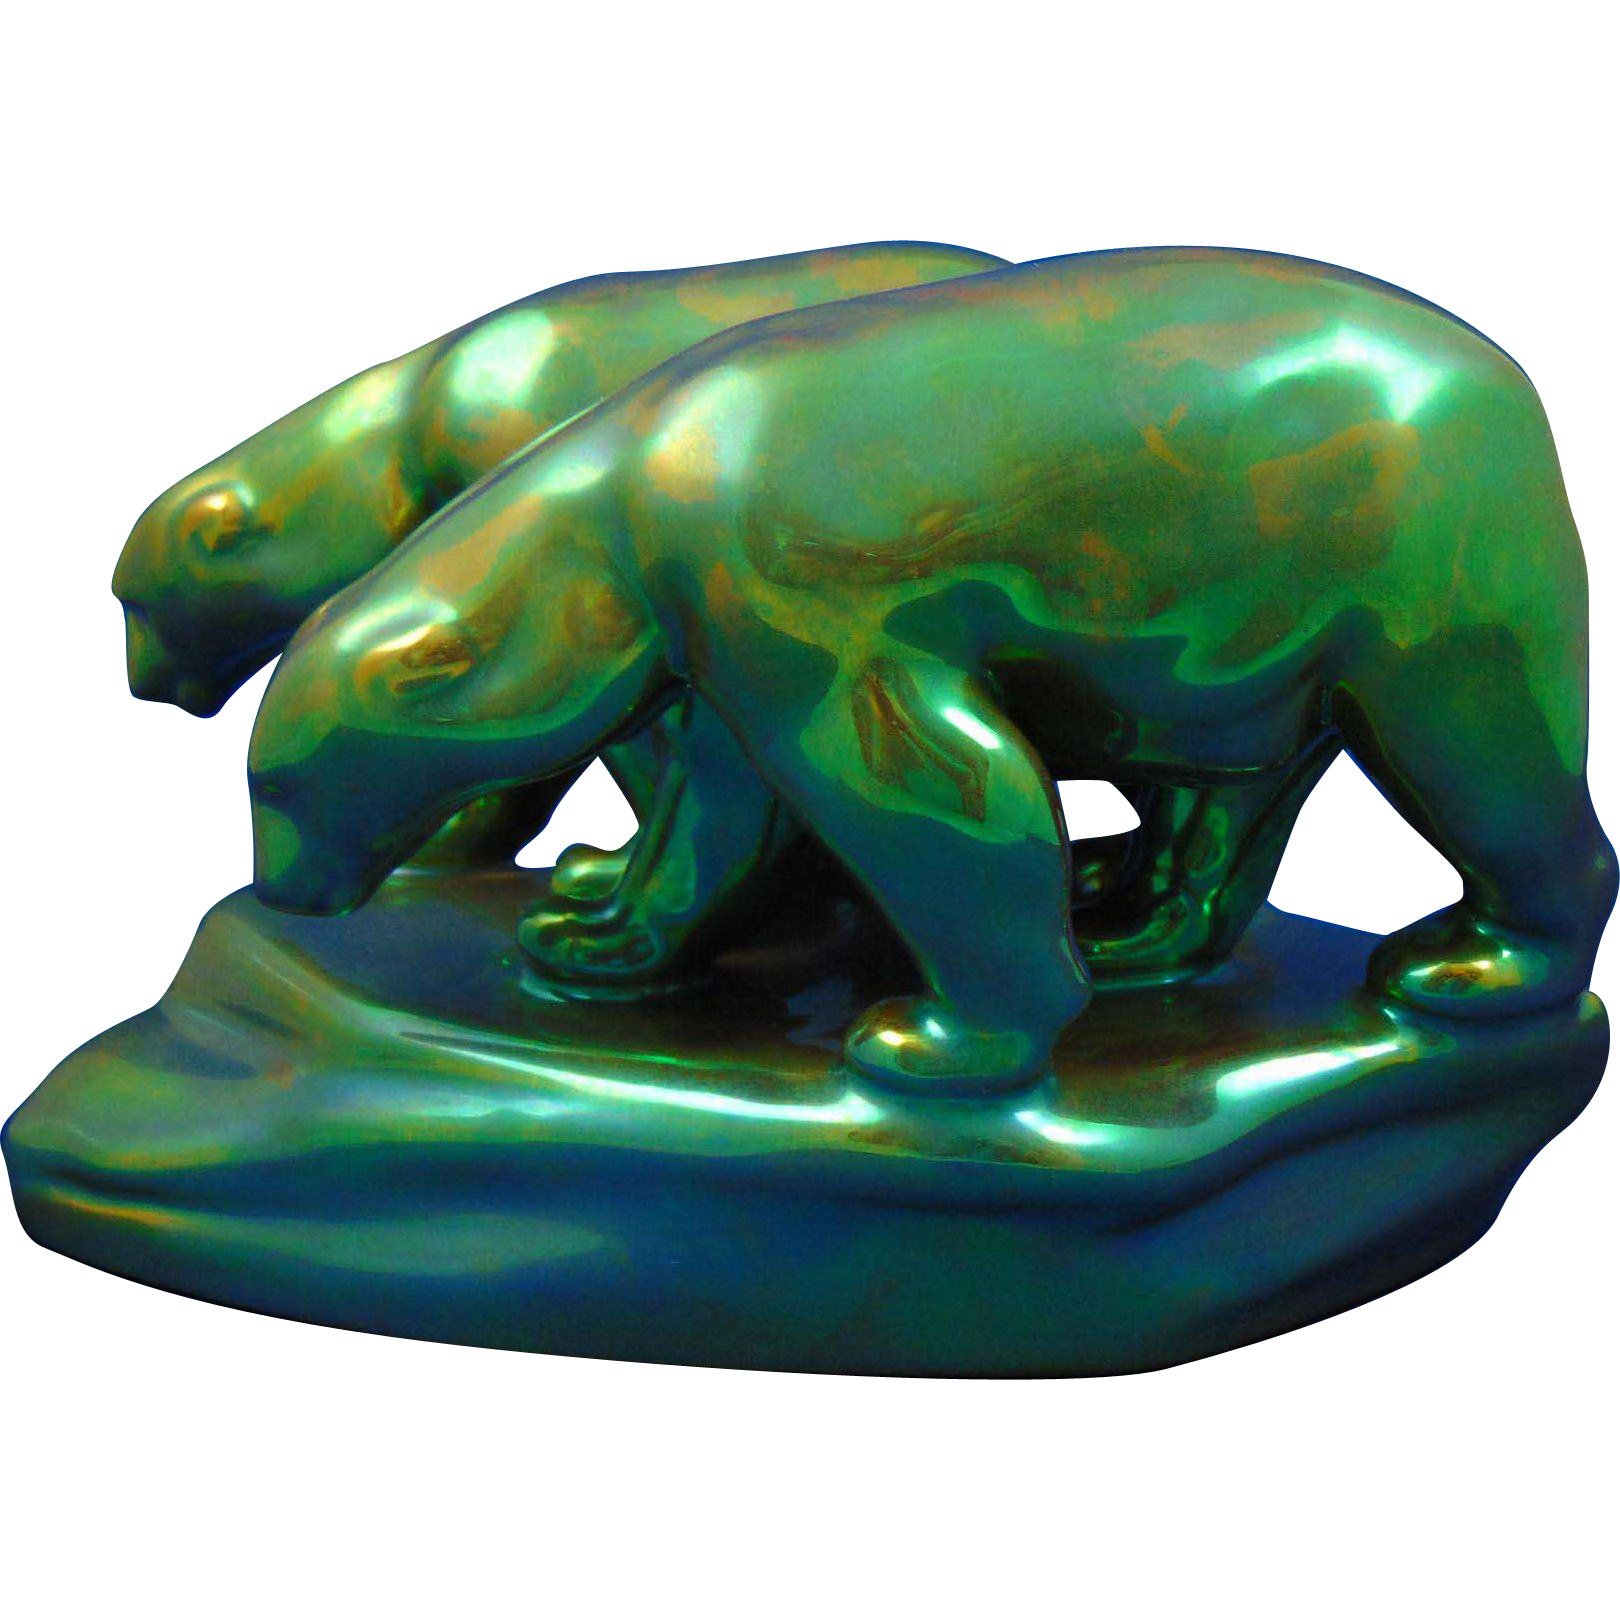 Zsolnay Hungary Eosin Green Polar Bears Figurine (c.1920-1940)